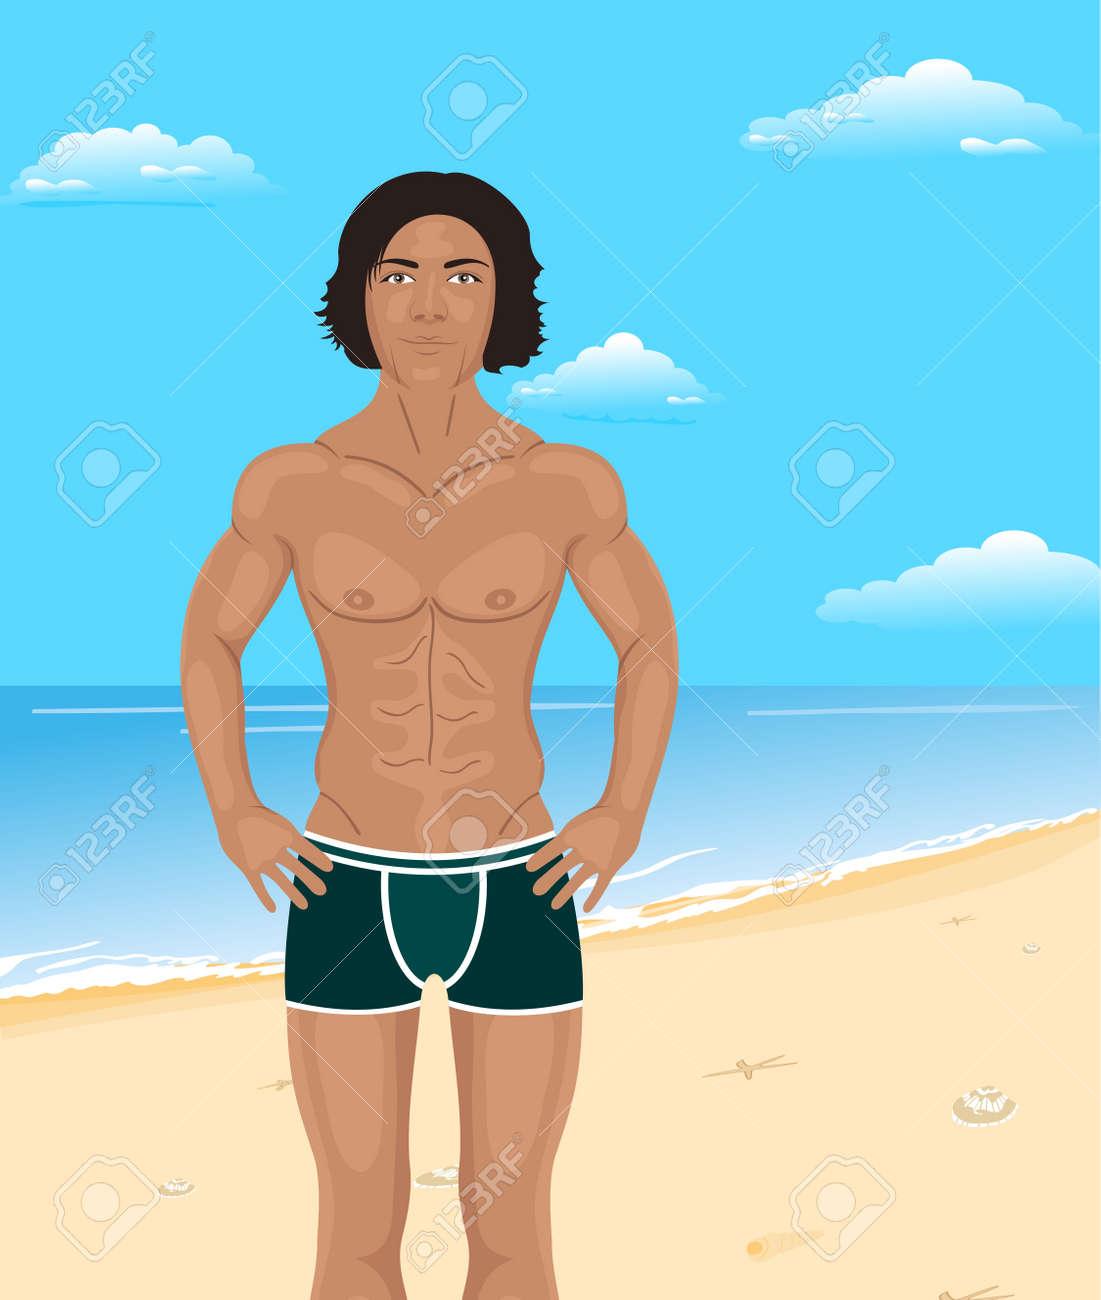 Illustration brawny man on beach - vector Stock Vector - 9488028